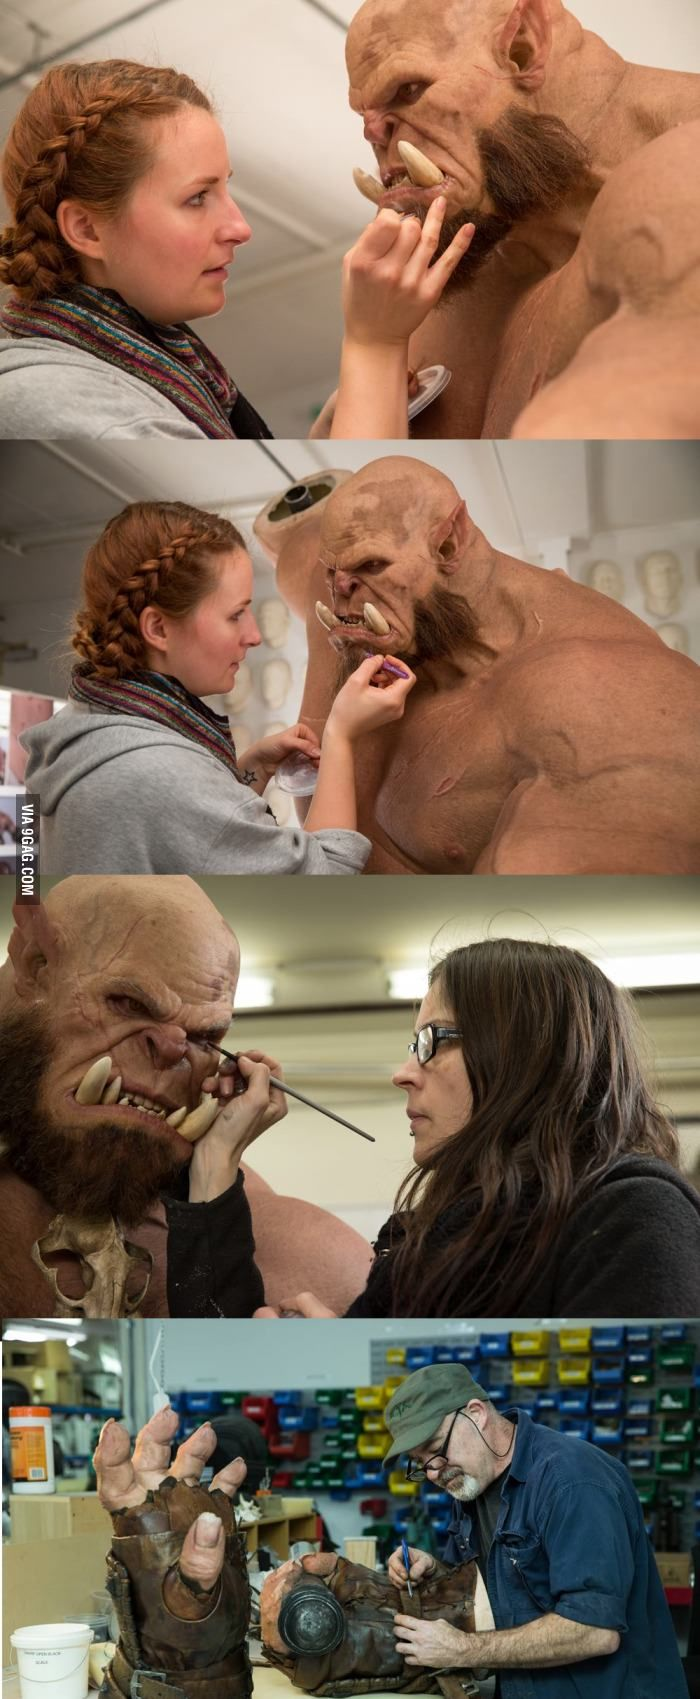 Warcraft Movie: Behind the Scenes - 9GAG